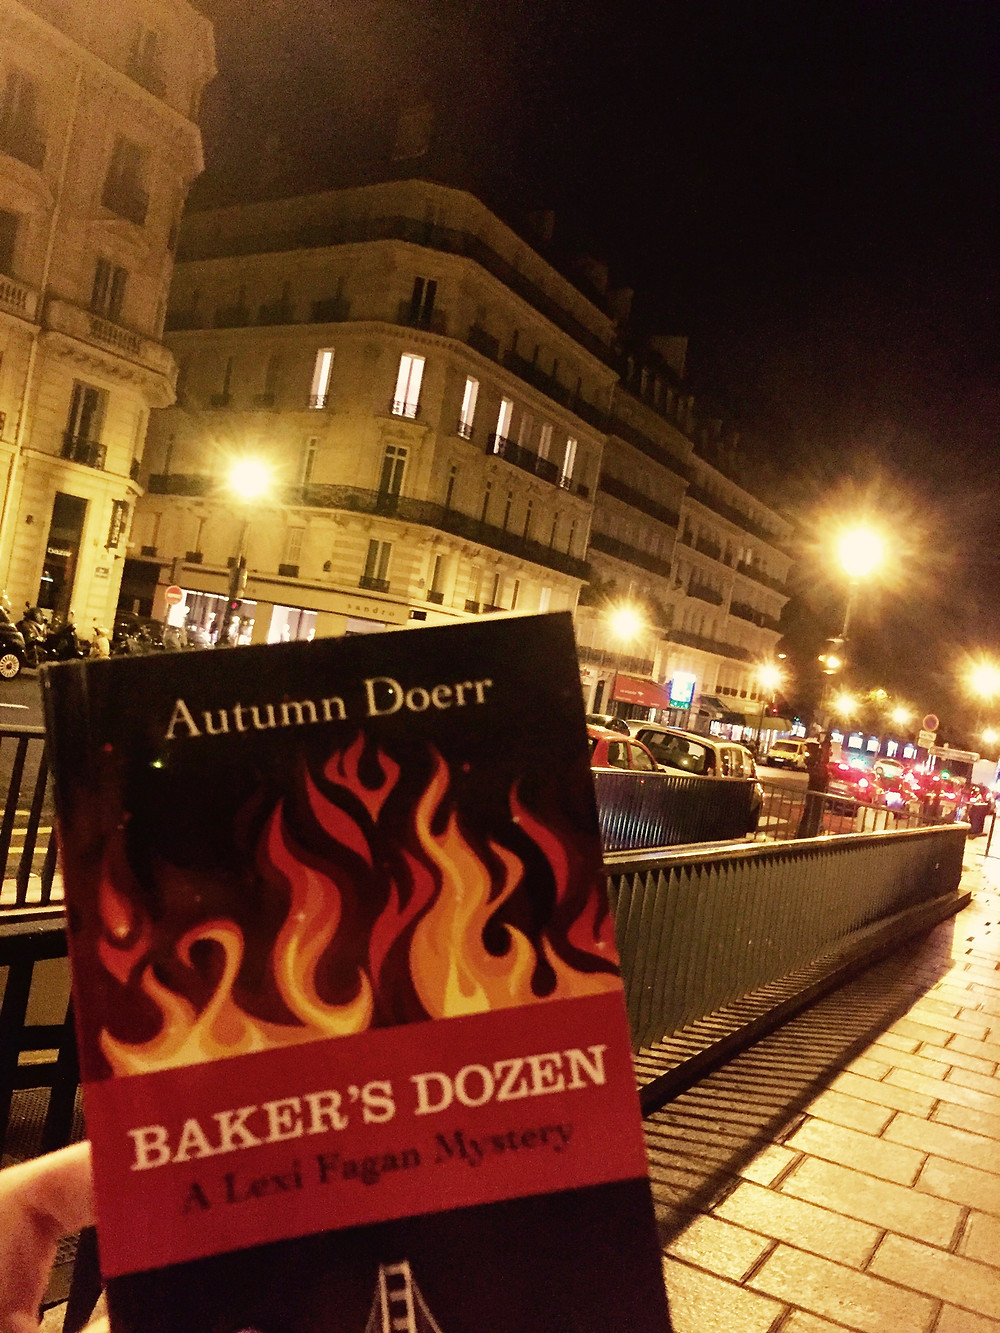 Paris, Book Promotion, Marketing your book